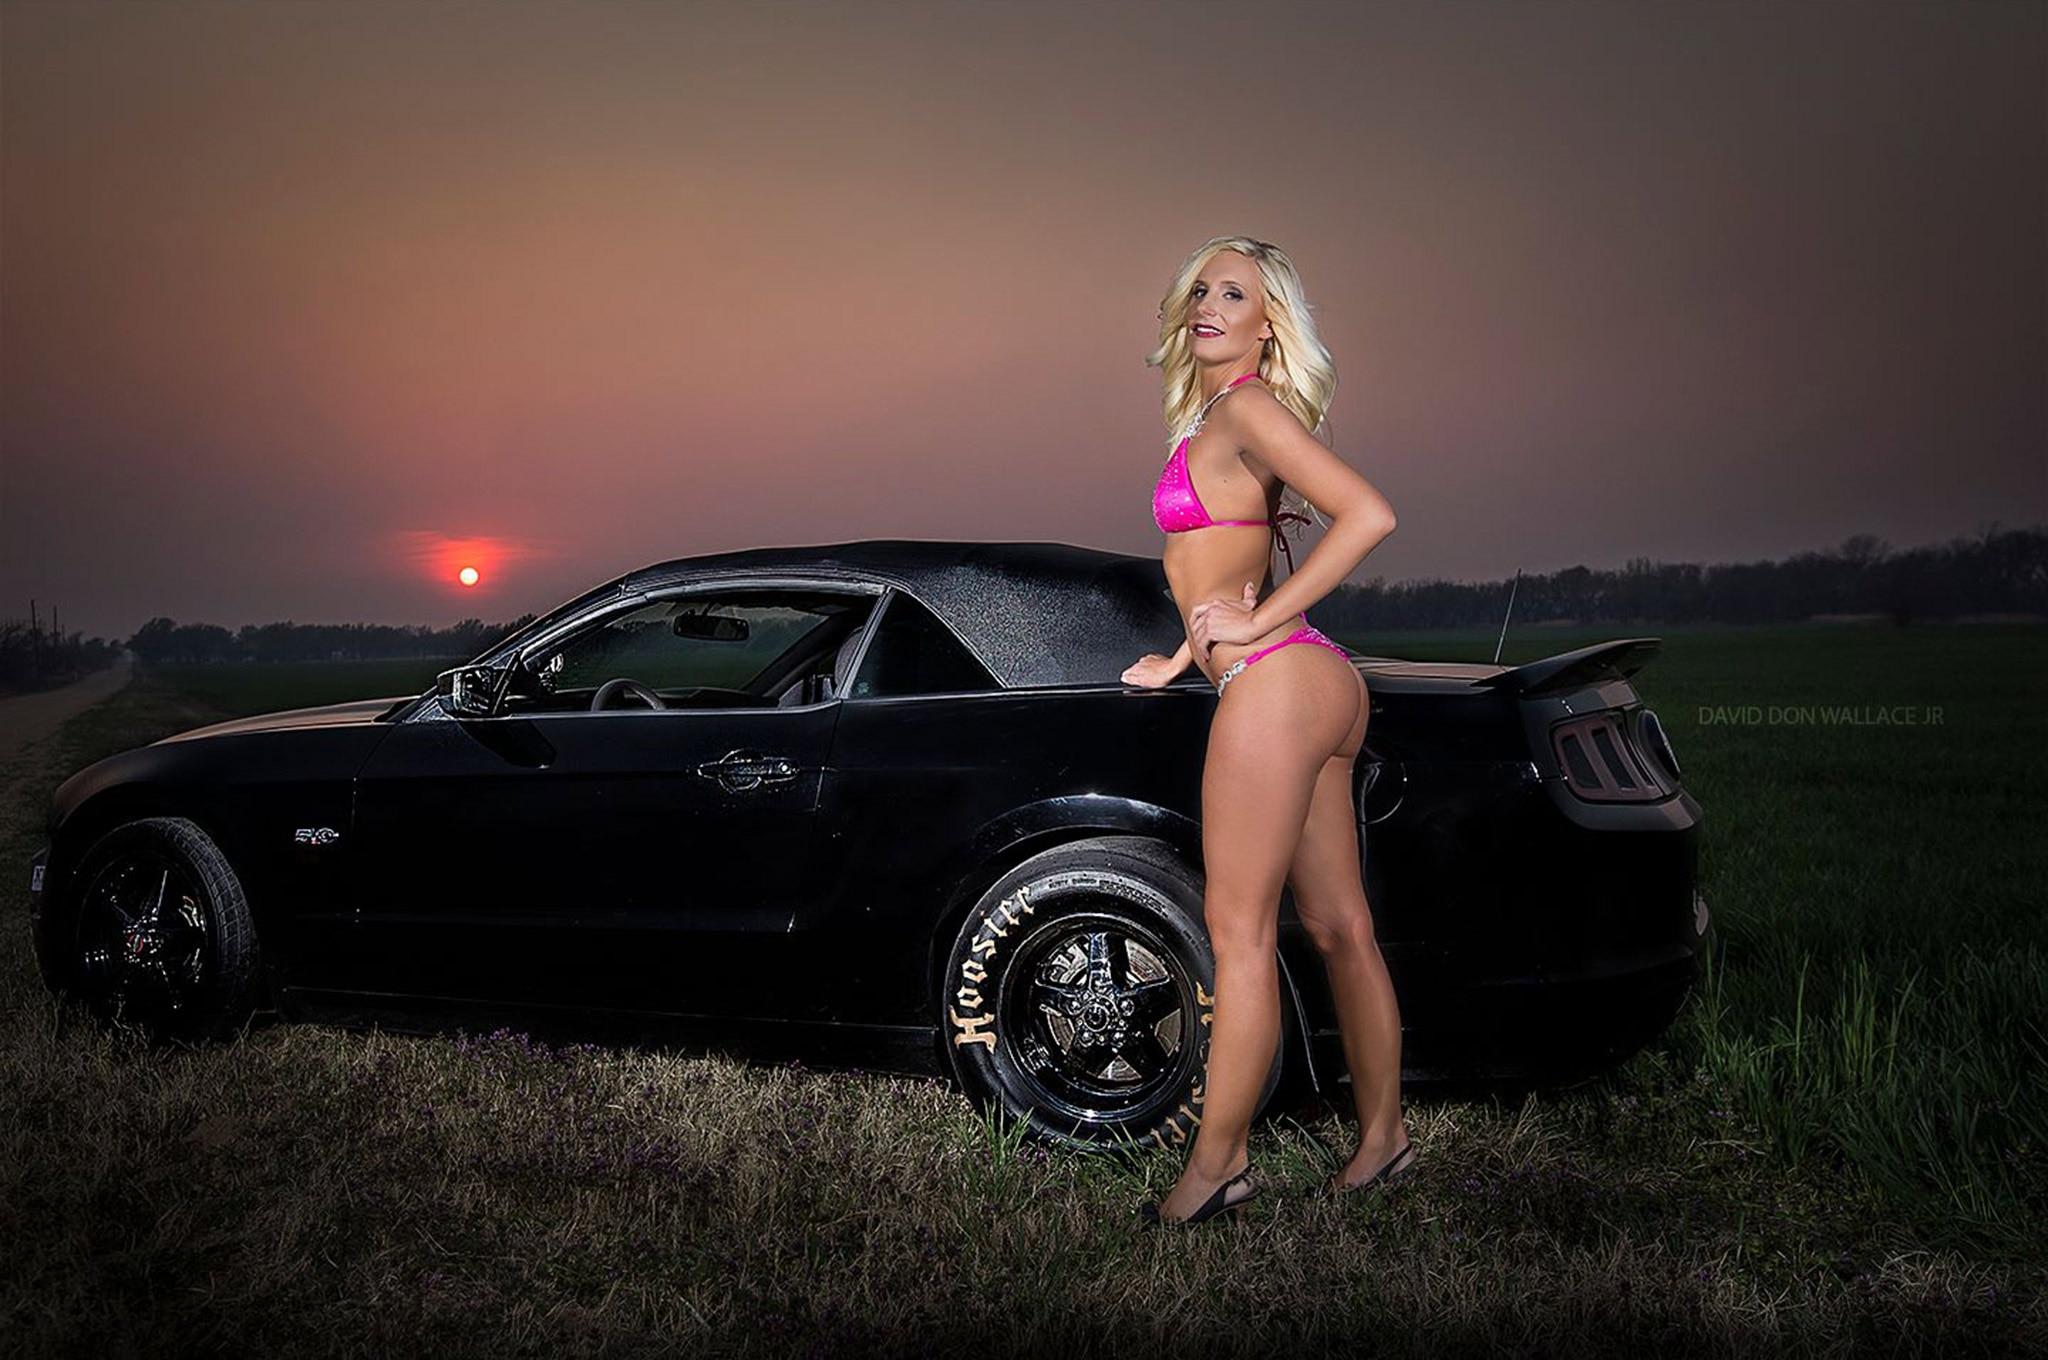 2013 Ford Mustang Gt Malorie Woods Bikini Shot